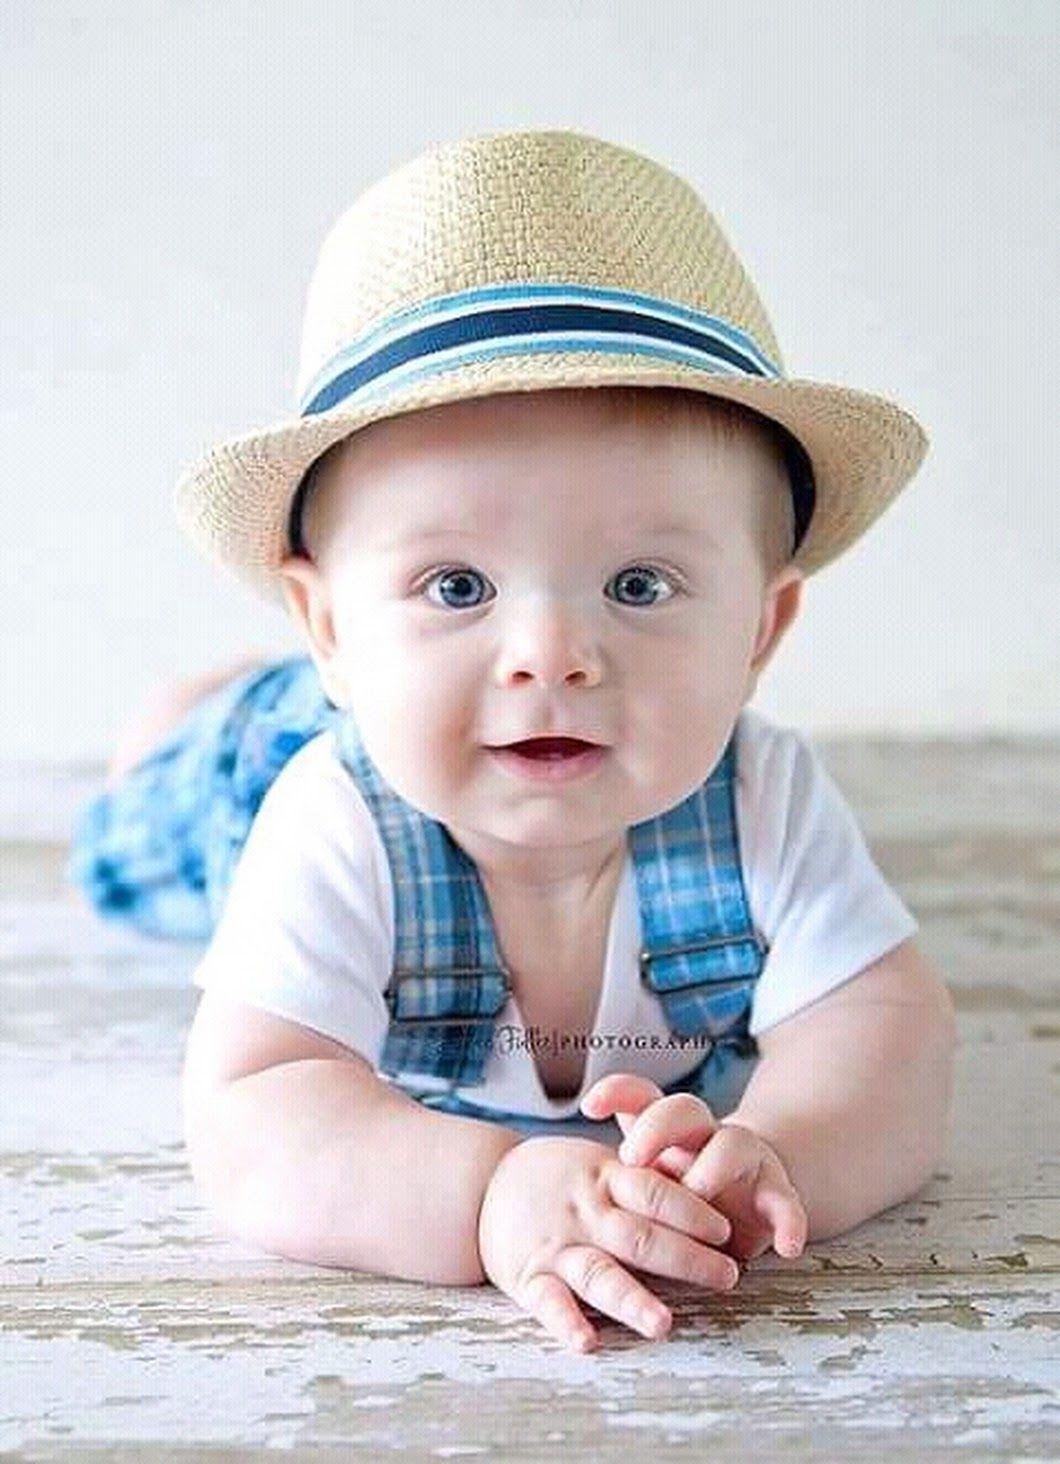 pinhunny adam on cute babies | pinterest | baby, cute babies and